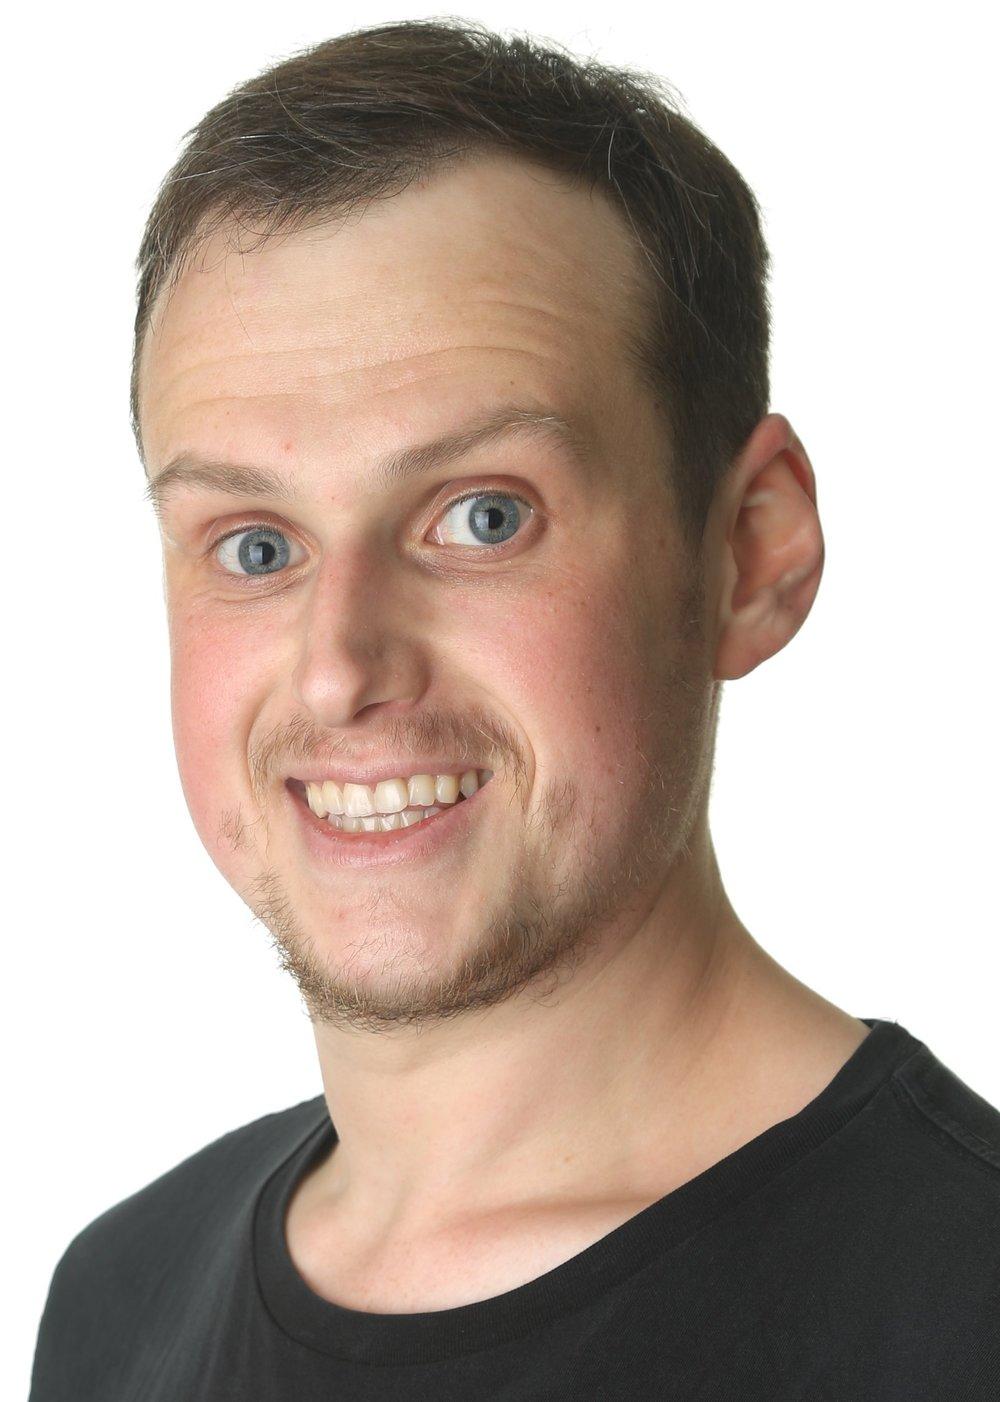 Headshot of James Young